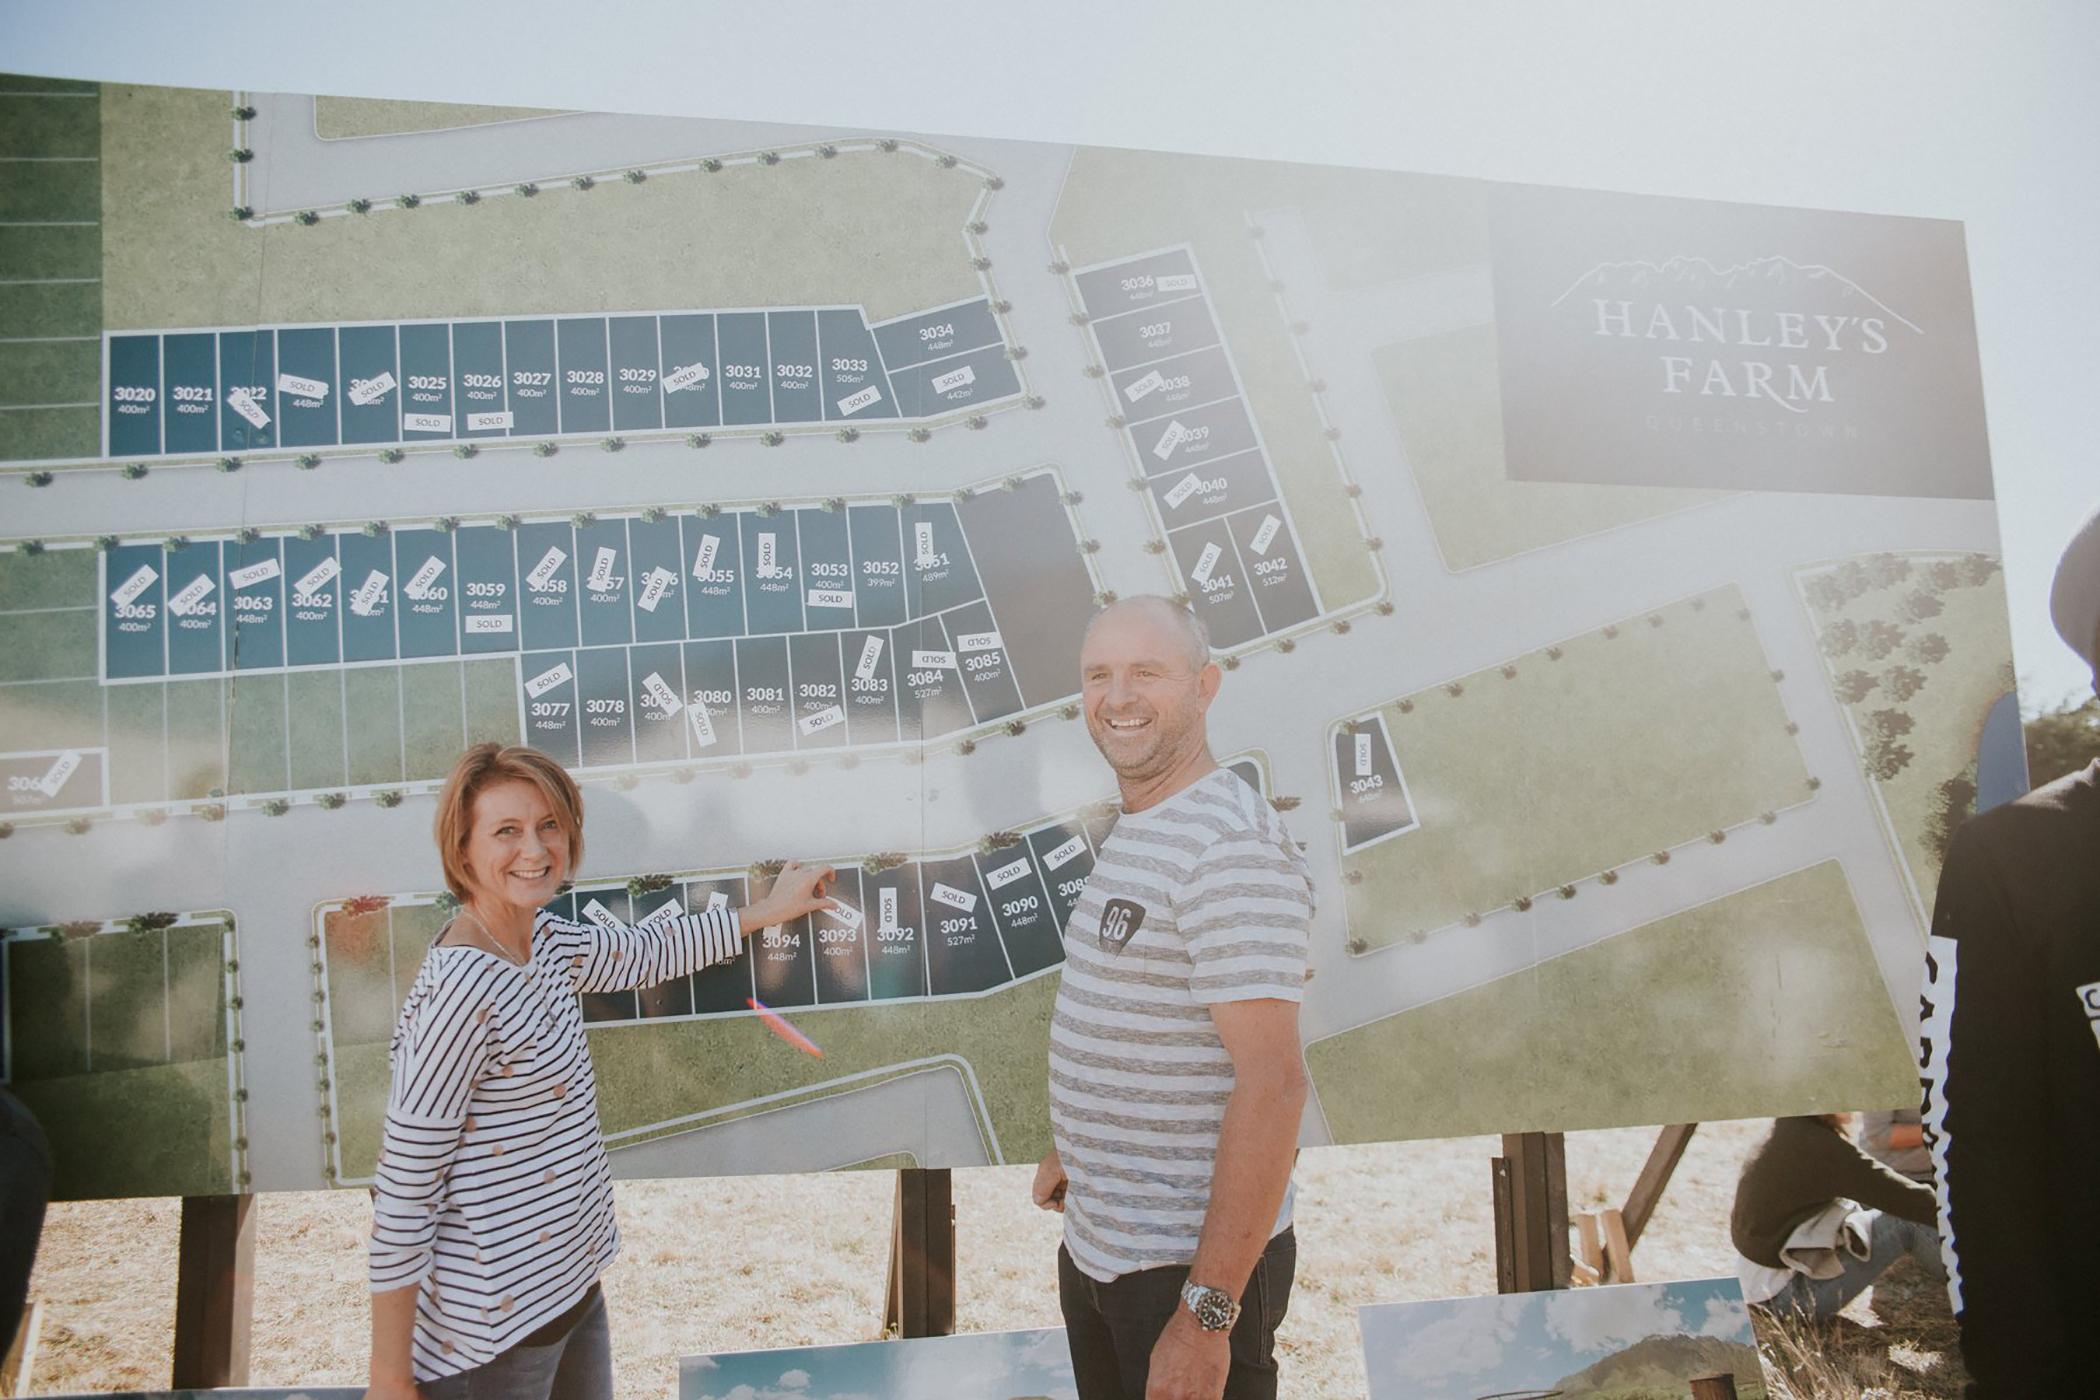 Hanleys Farm Masterplan Billboard 2